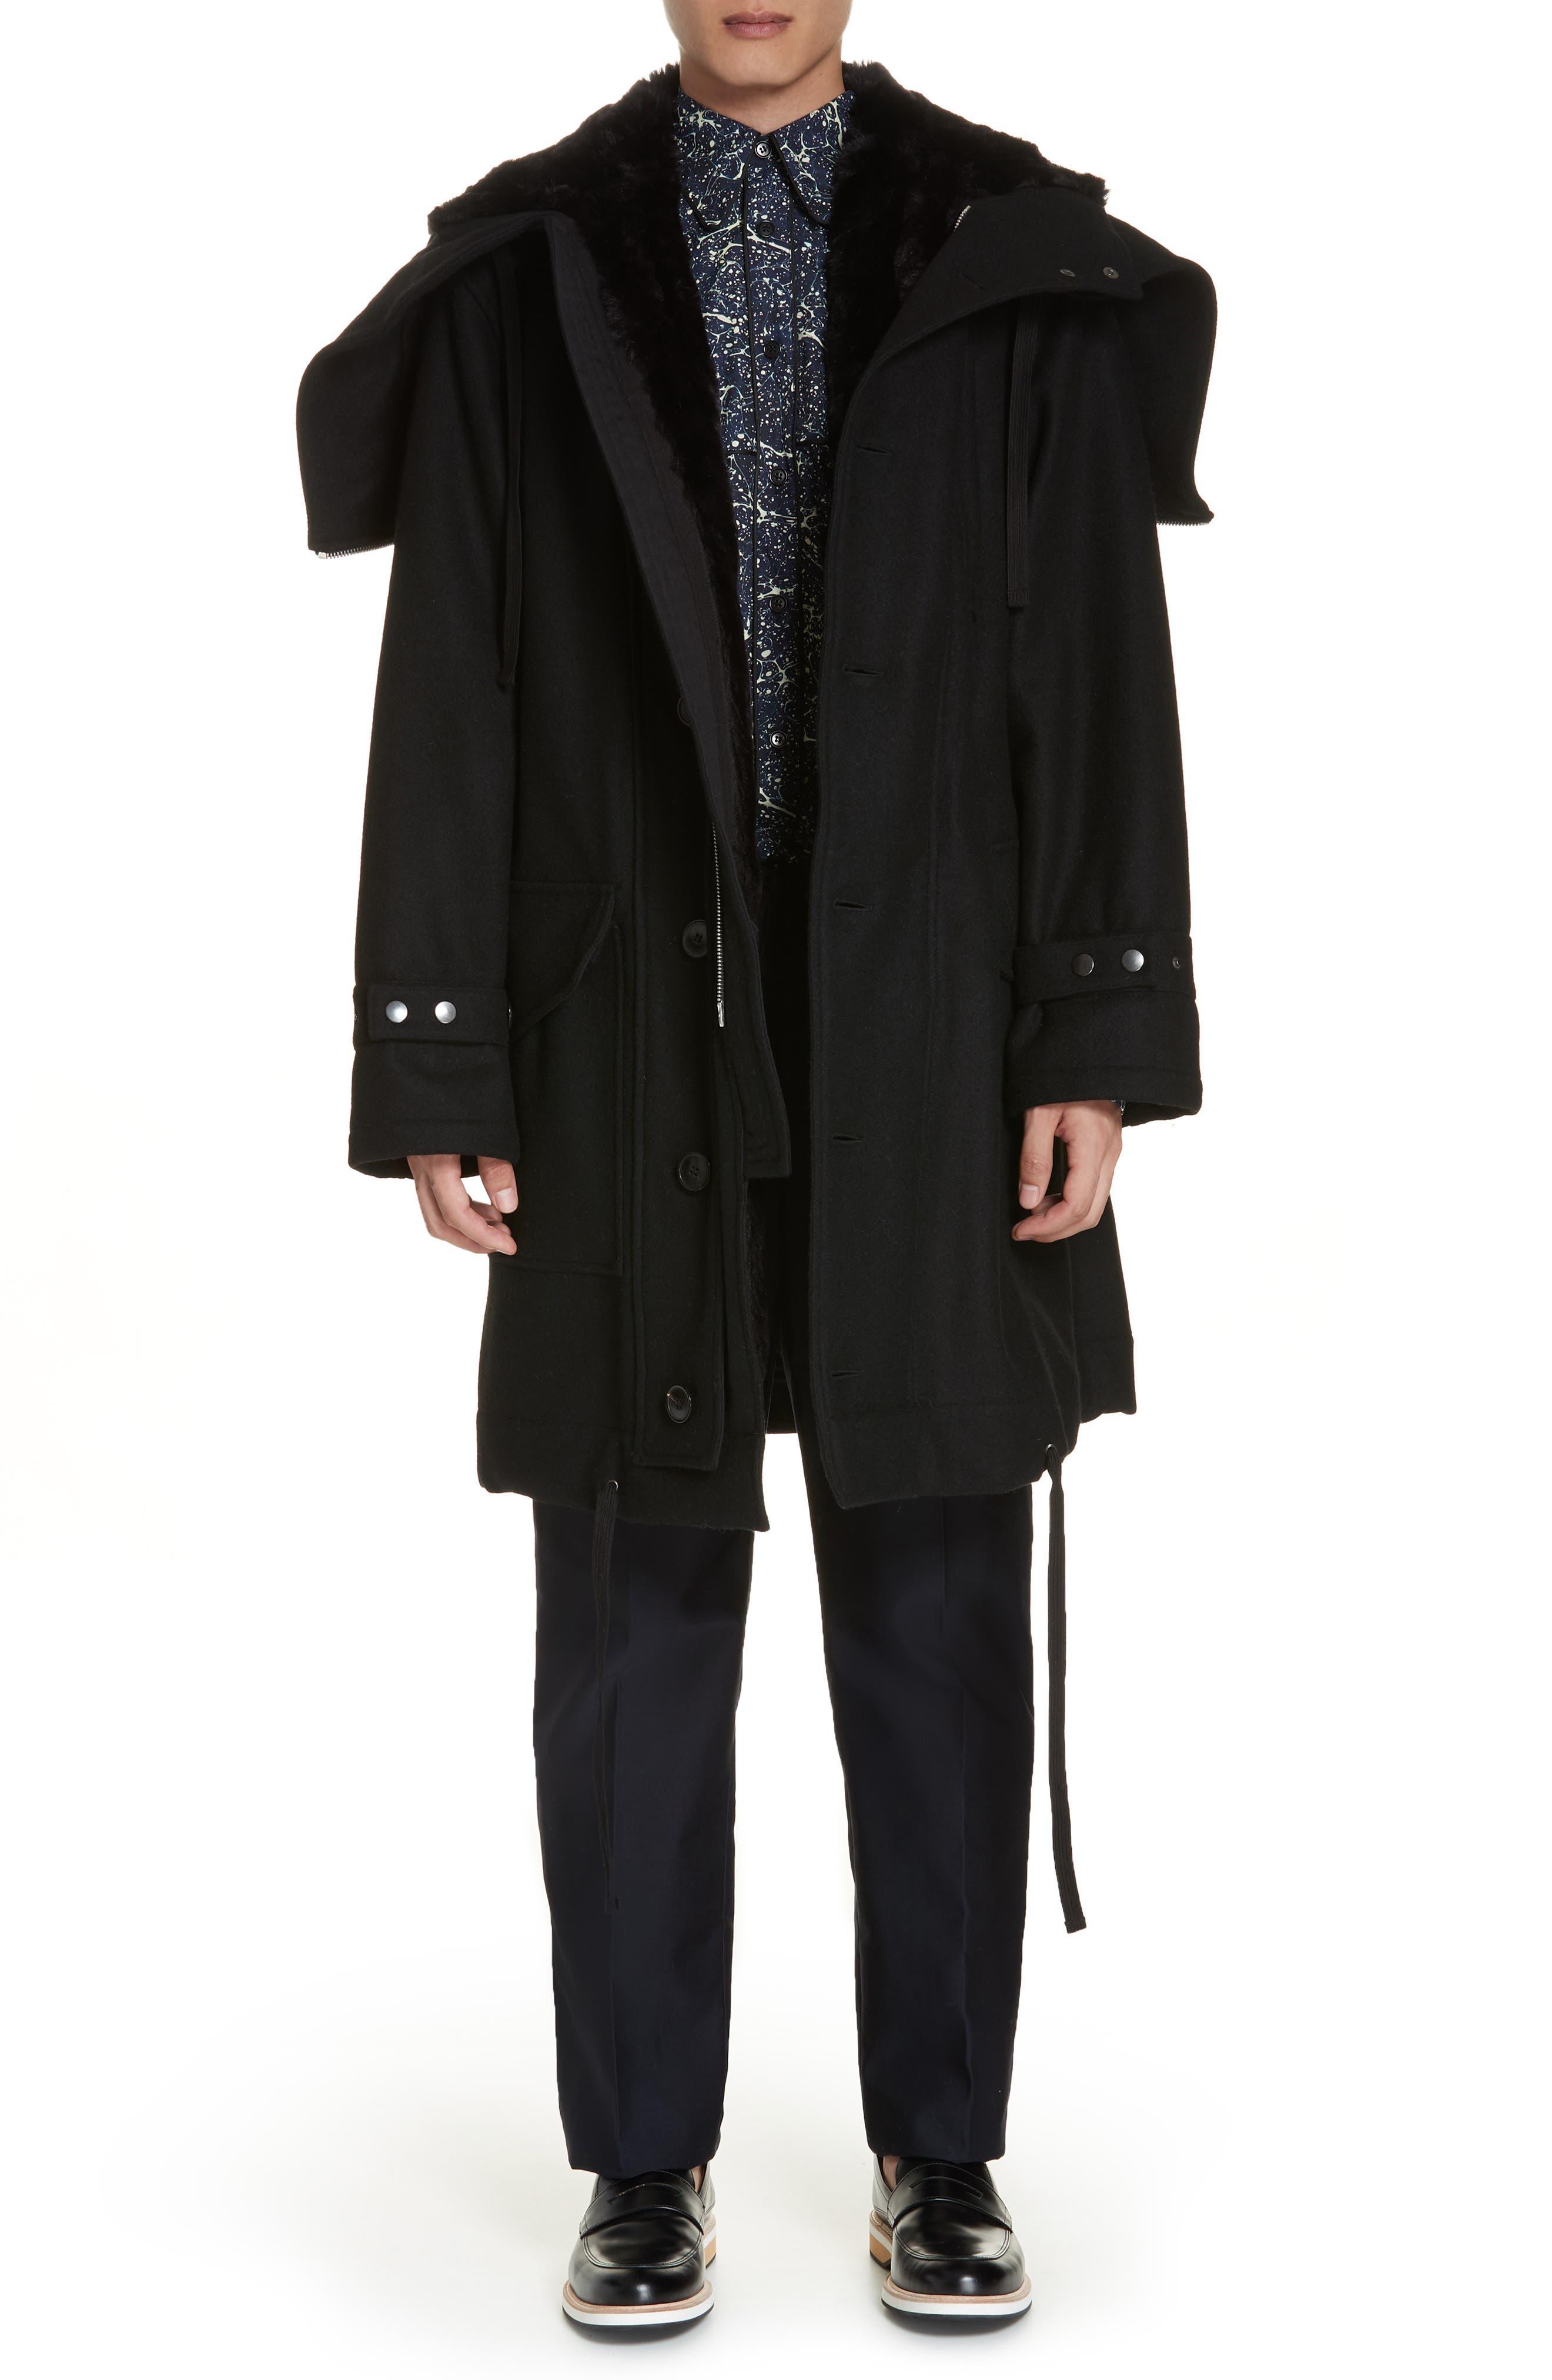 Verreli Hooded Parka with Faux Fur Trim,                         Main,                         color, BLACK 900